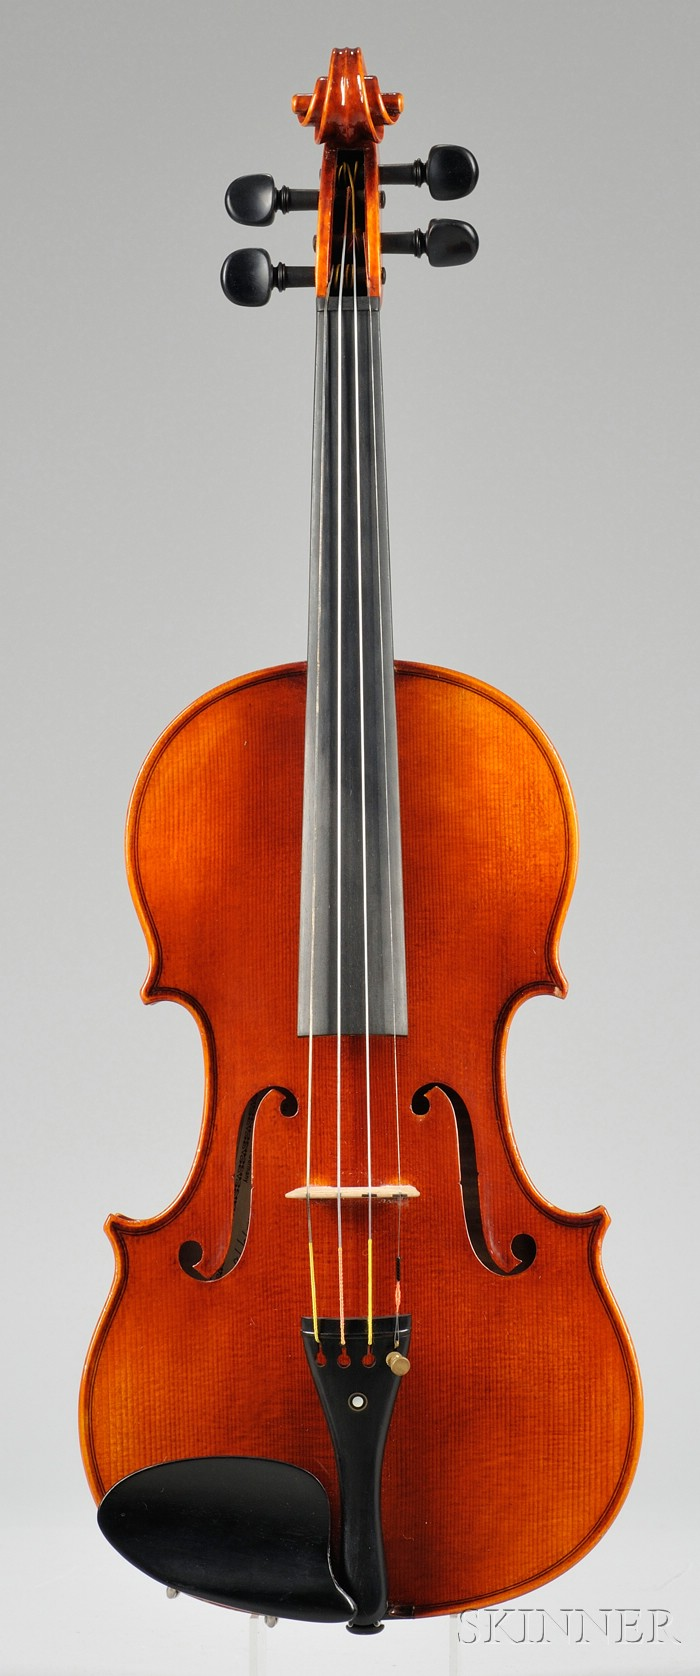 Modern Violin, Roman Teller, Erlangen, 1972